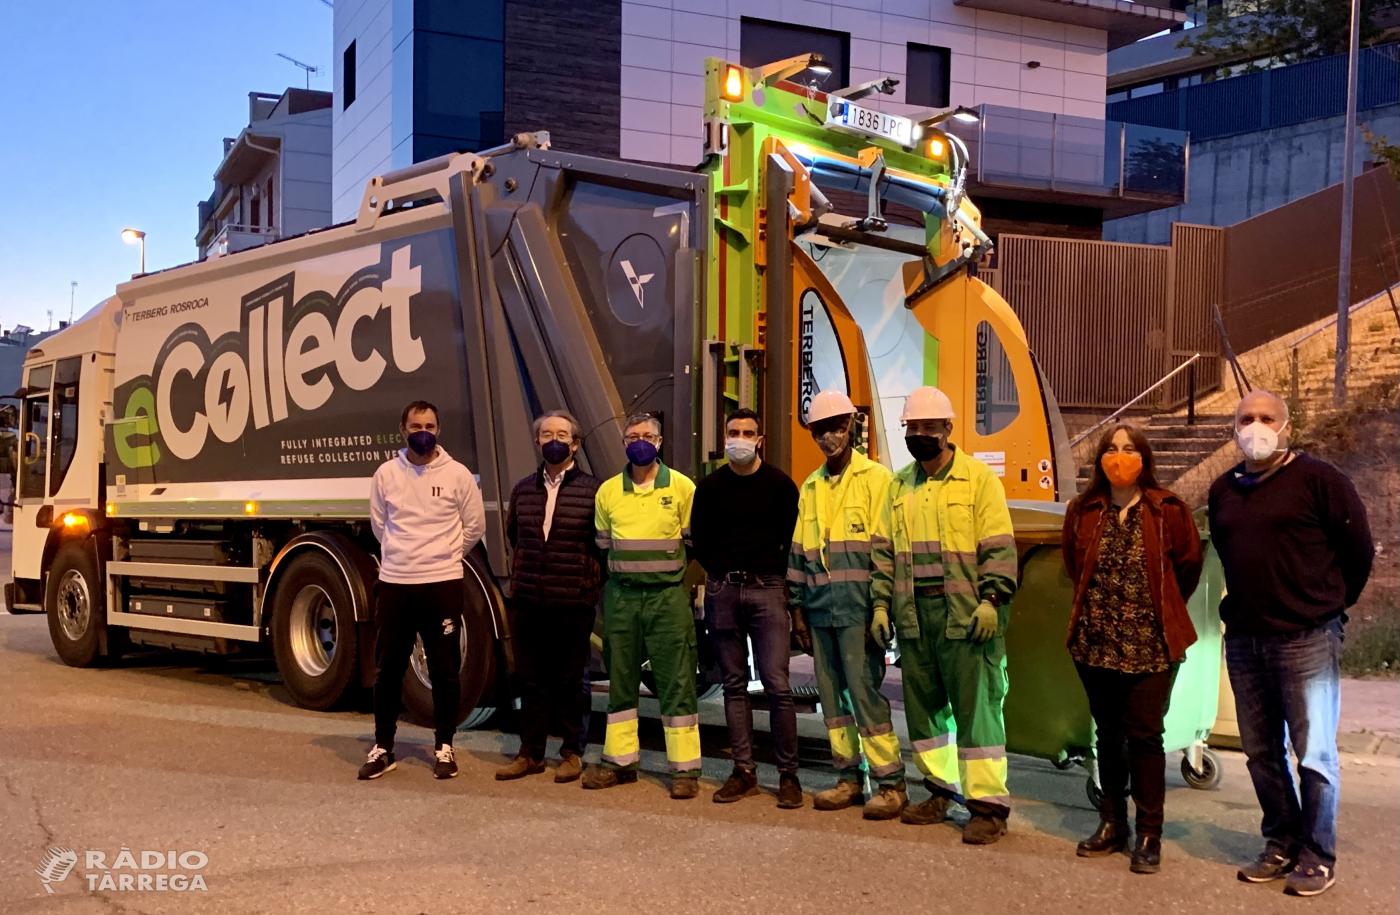 'eCollect',  zero emissions durant la recollida de residus